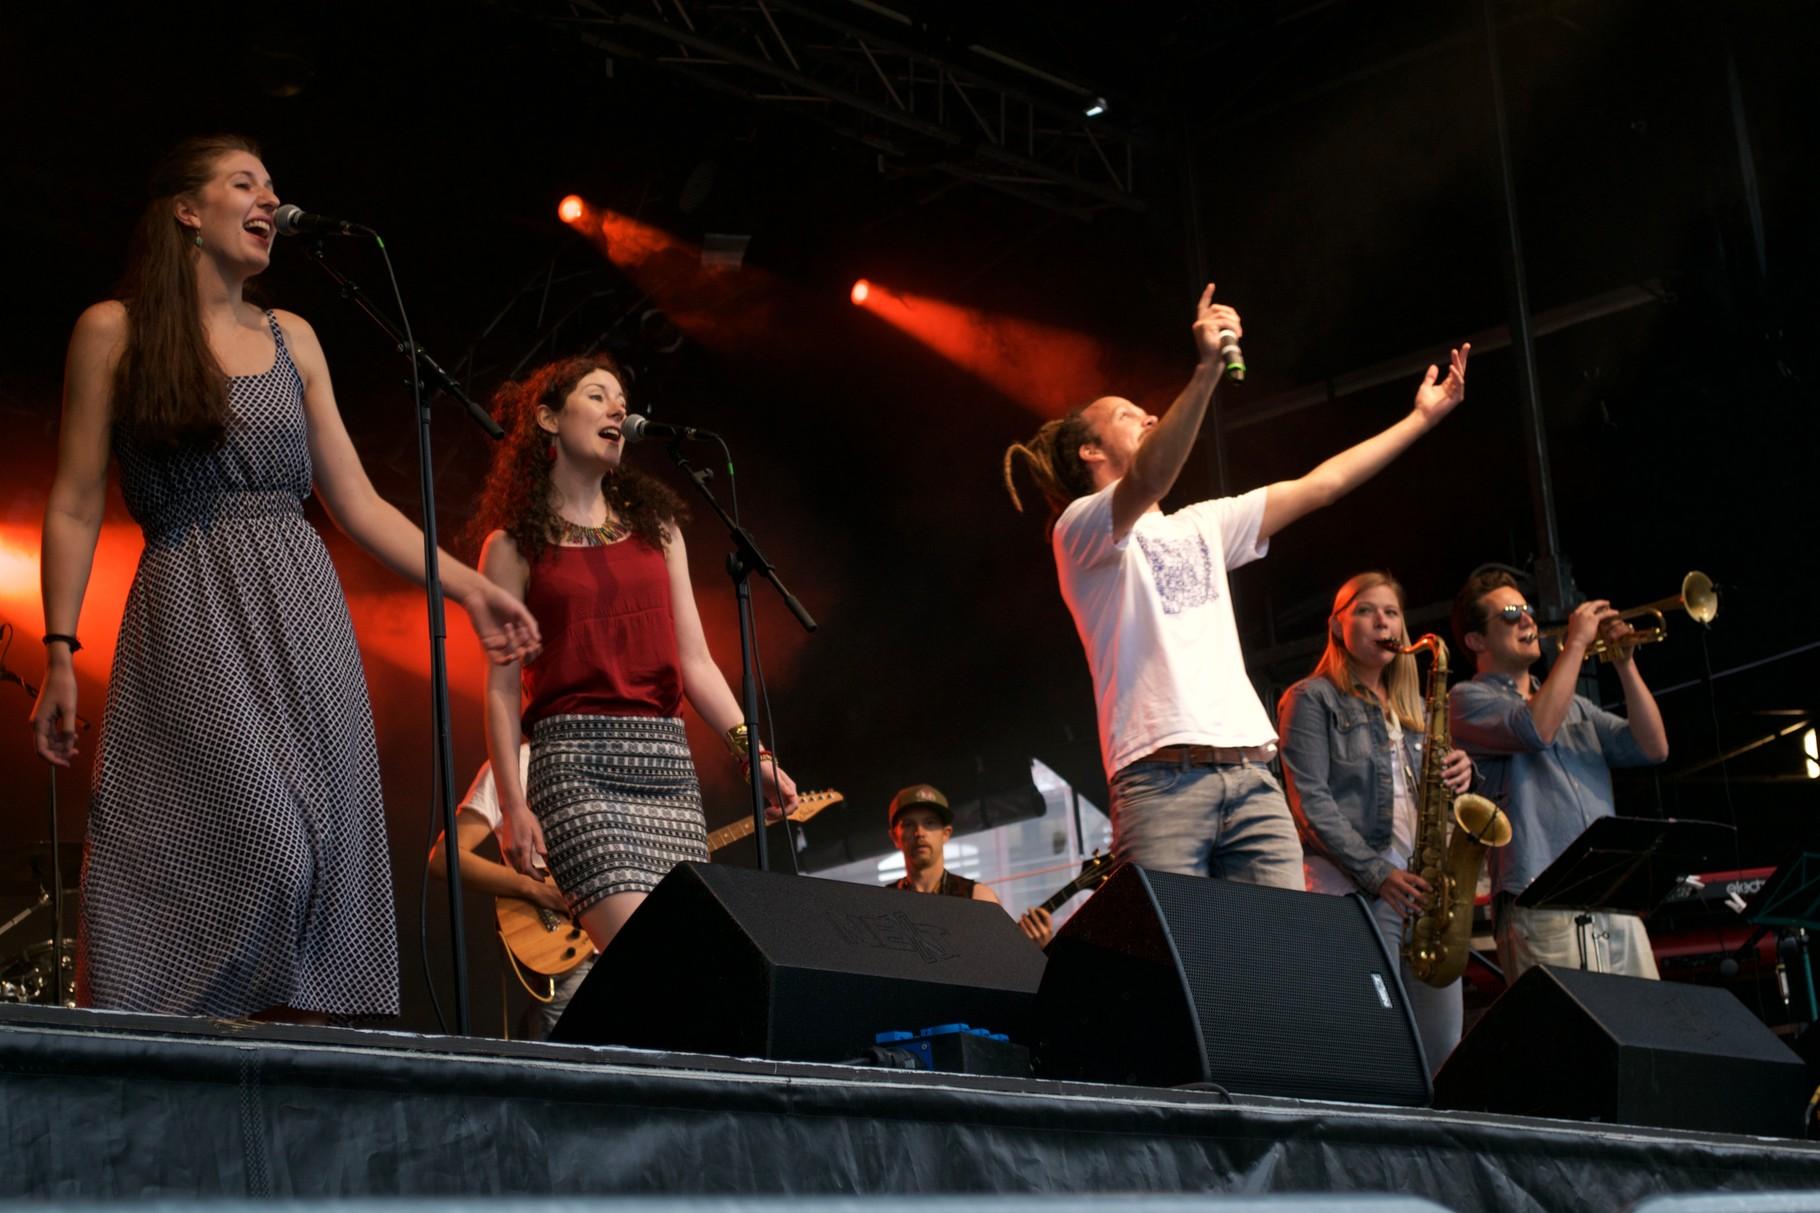 Reeds Festival, 2015